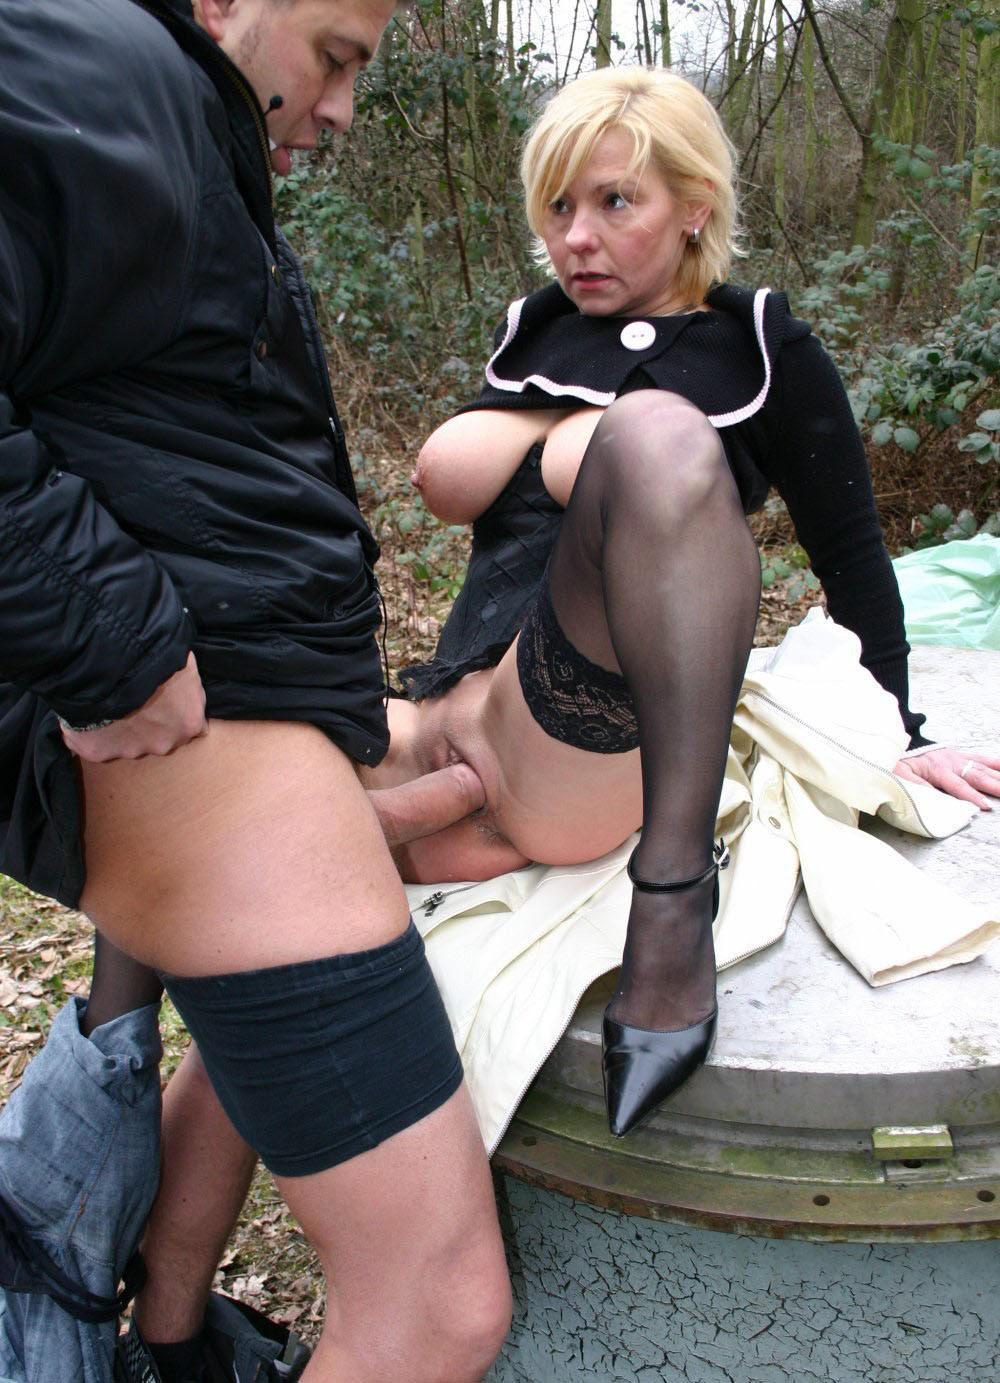 Лола феррари порно видео со зрелой дамой на улице